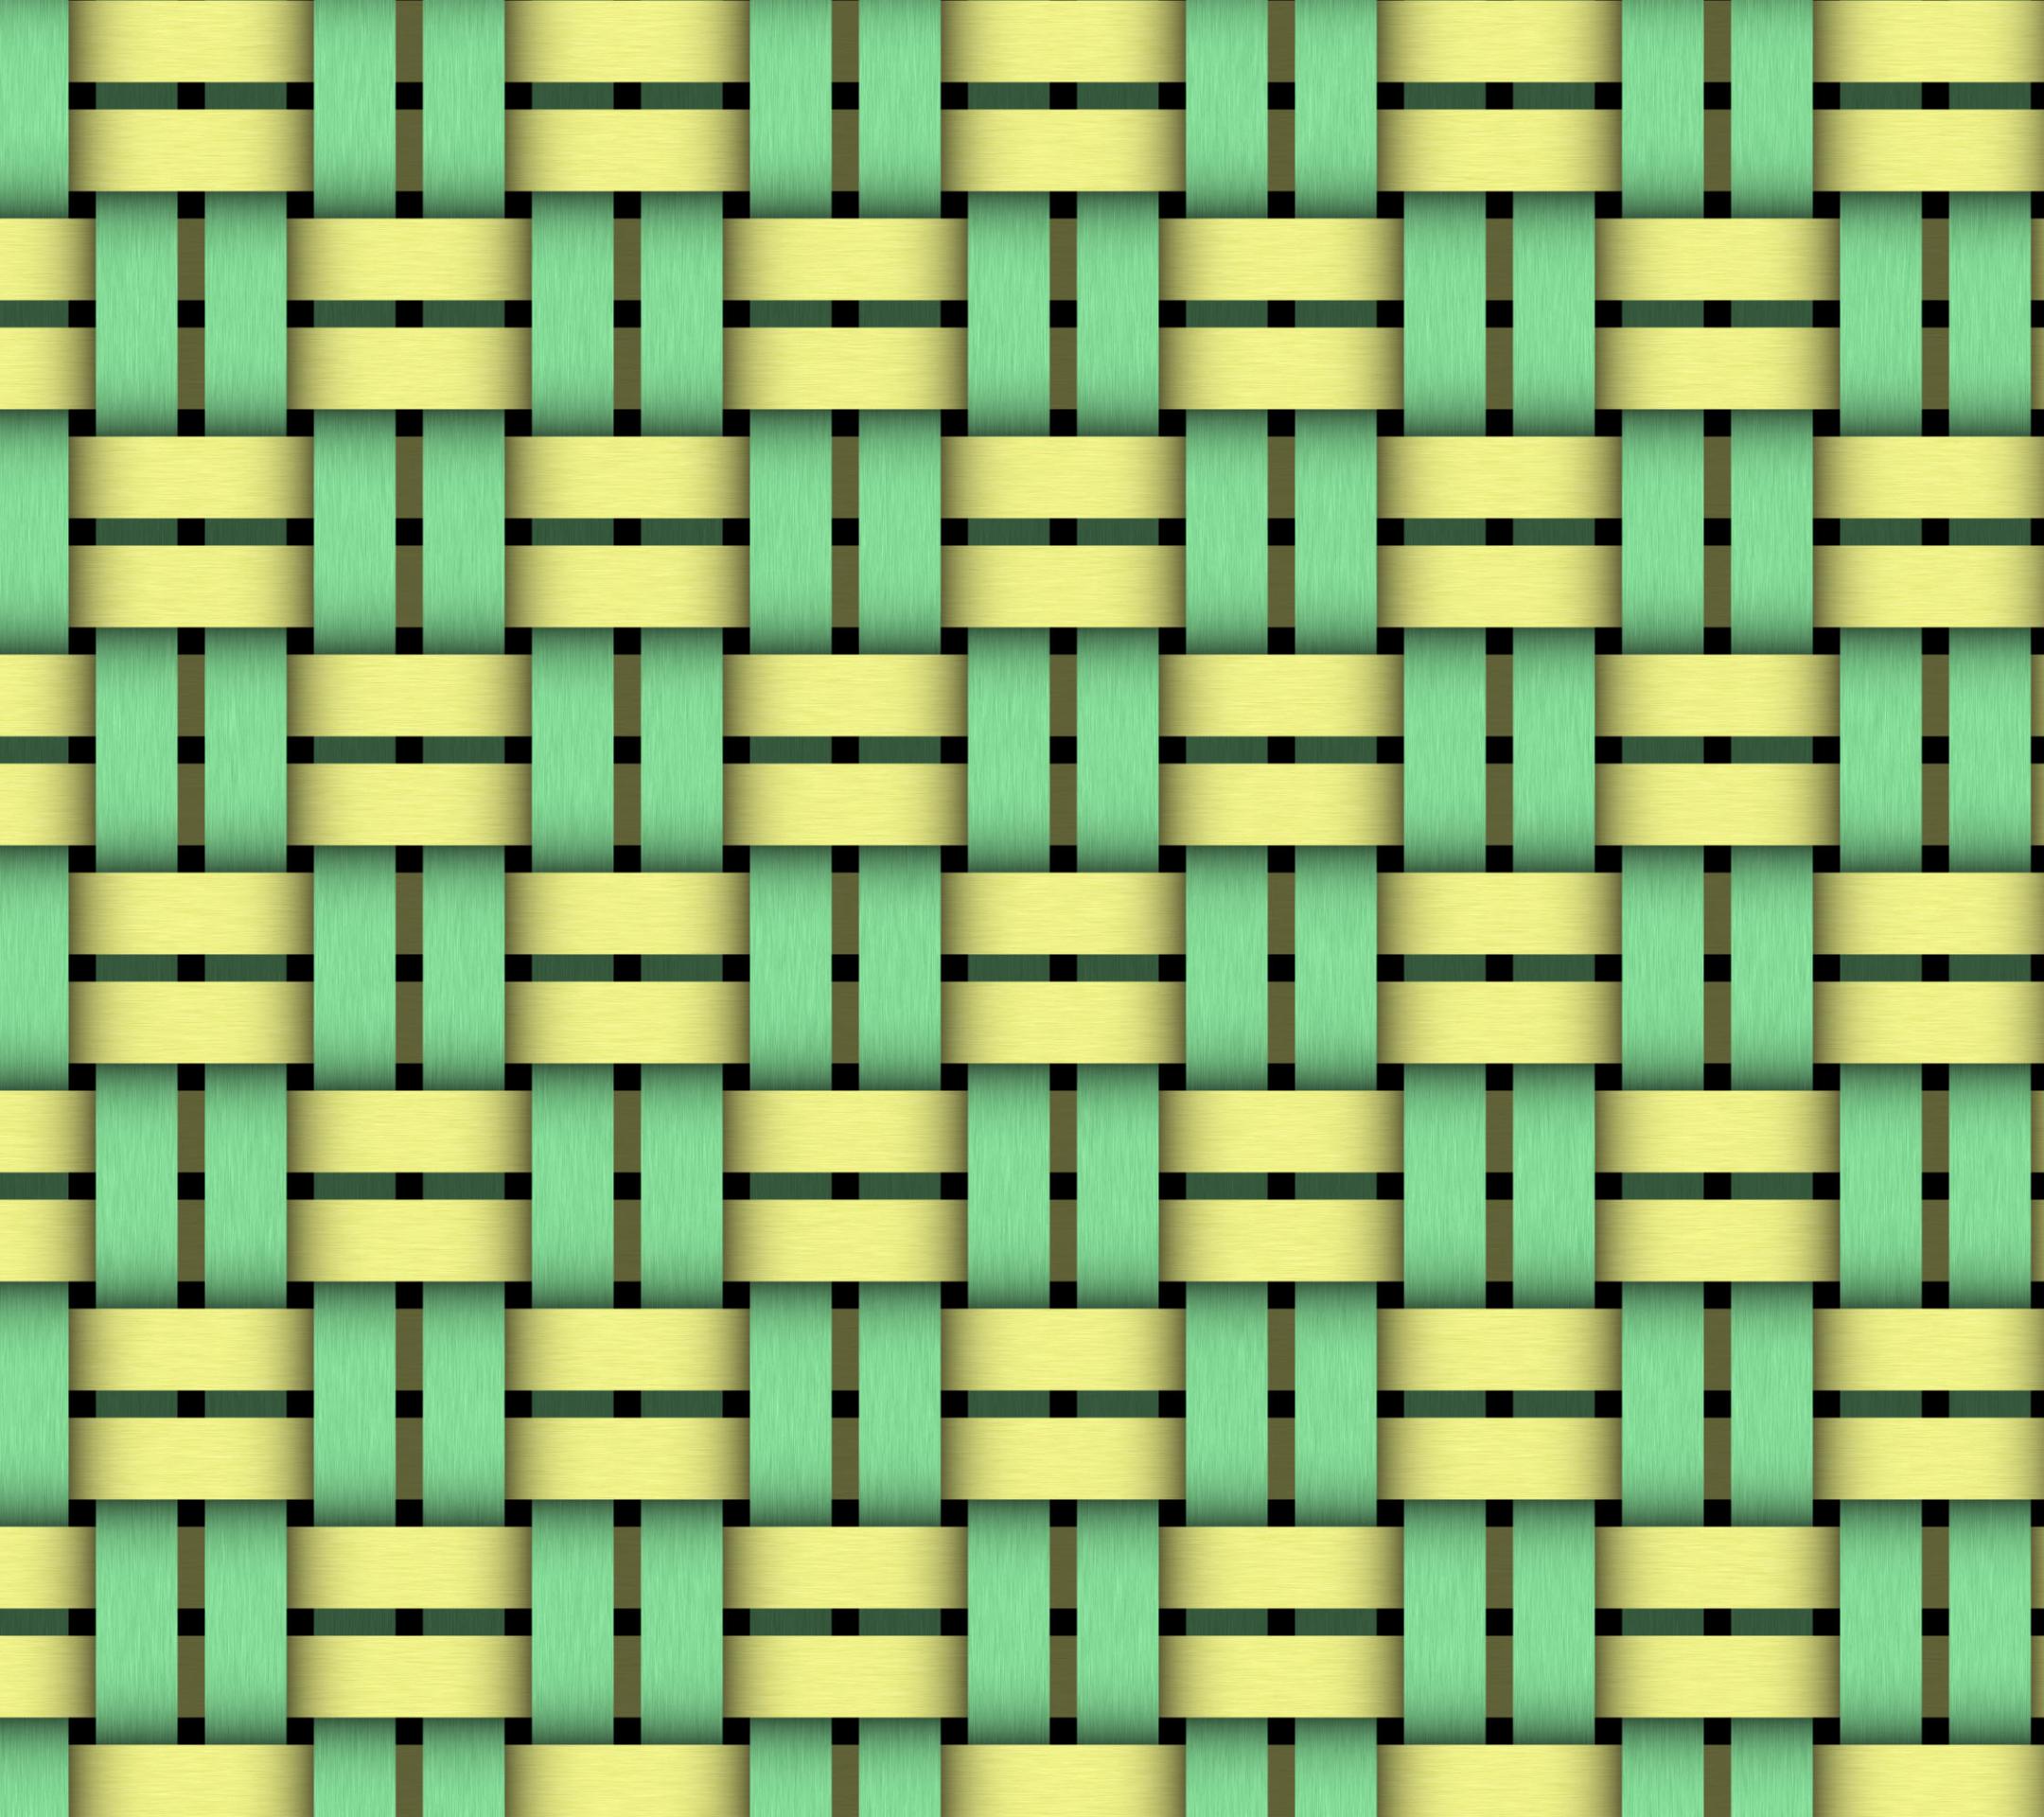 Wallpaper 788090